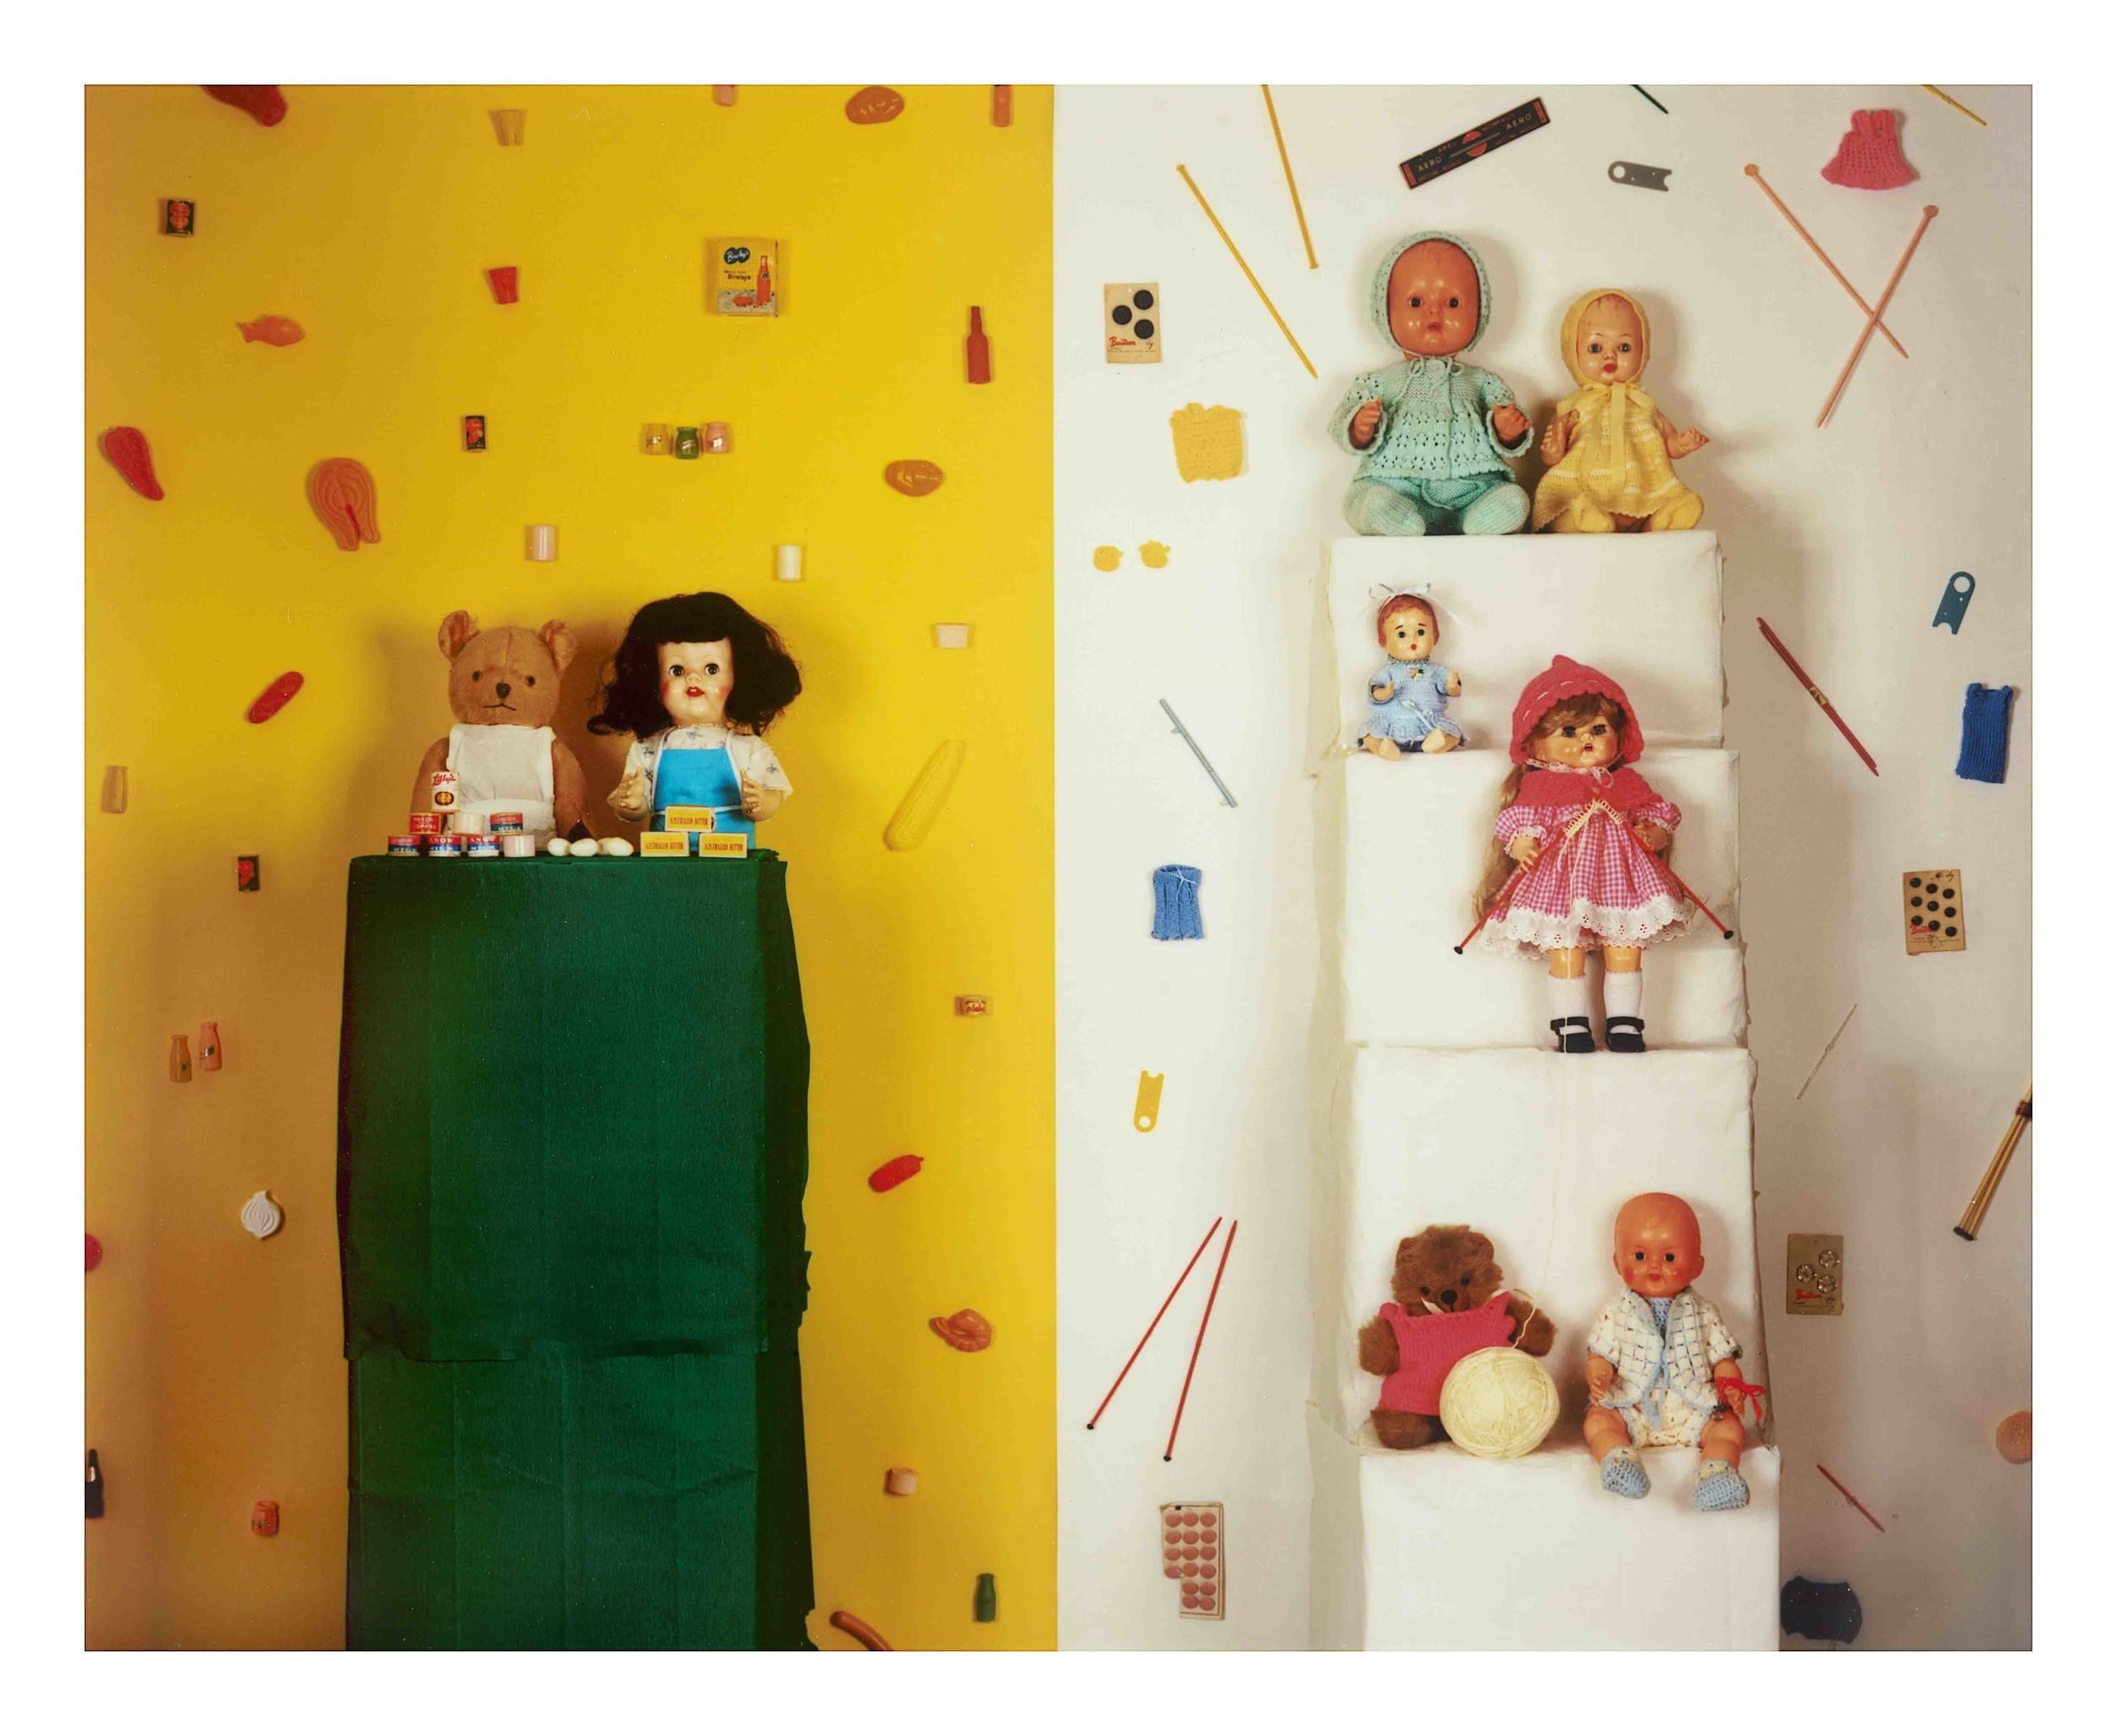 JACKY REDGATE   Unfold - Food Shop and Knitting   2016   chromogenic photograph   205 x 244 cm